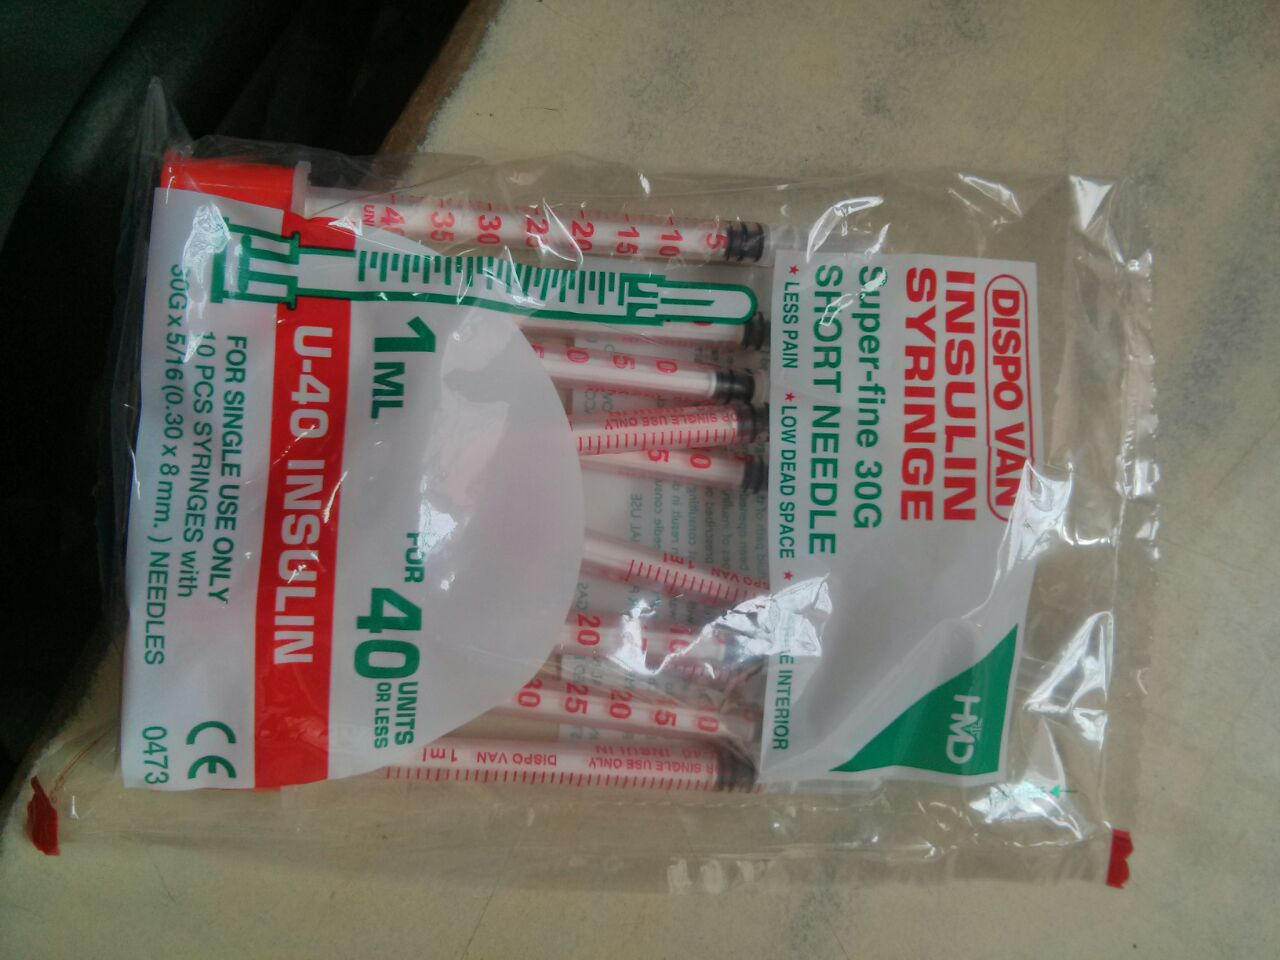 DISPOVAN 1ML INSULIN SYRINGE 40 U (30G) MULTI PACK